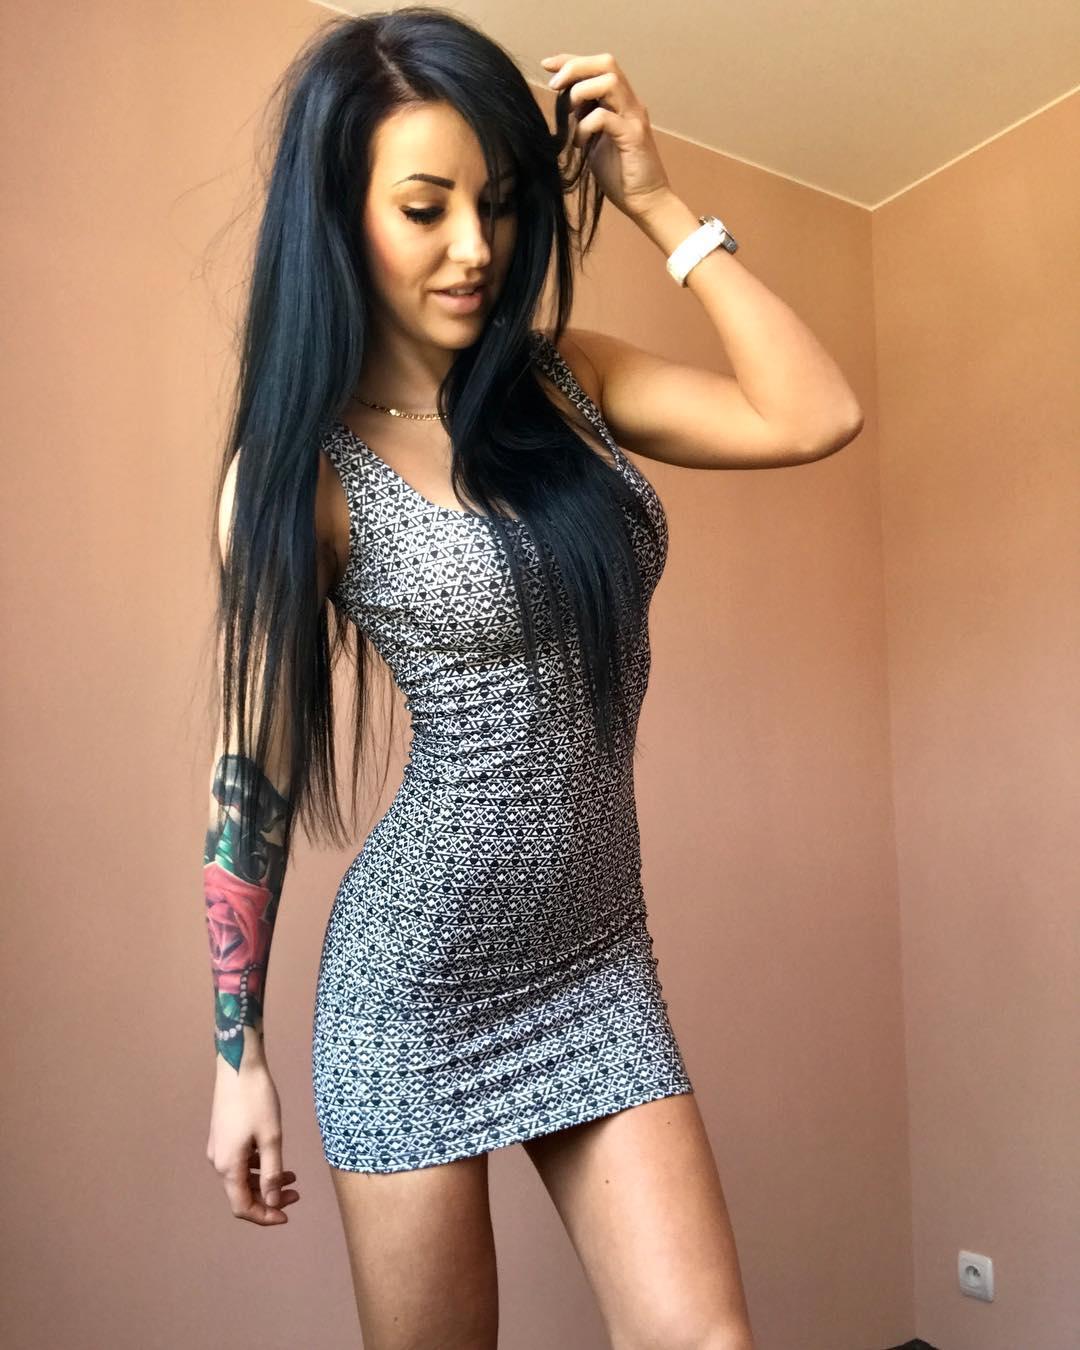 Natalia-Fitnesska-Wallpapers-Insta-Fit-Bio-6